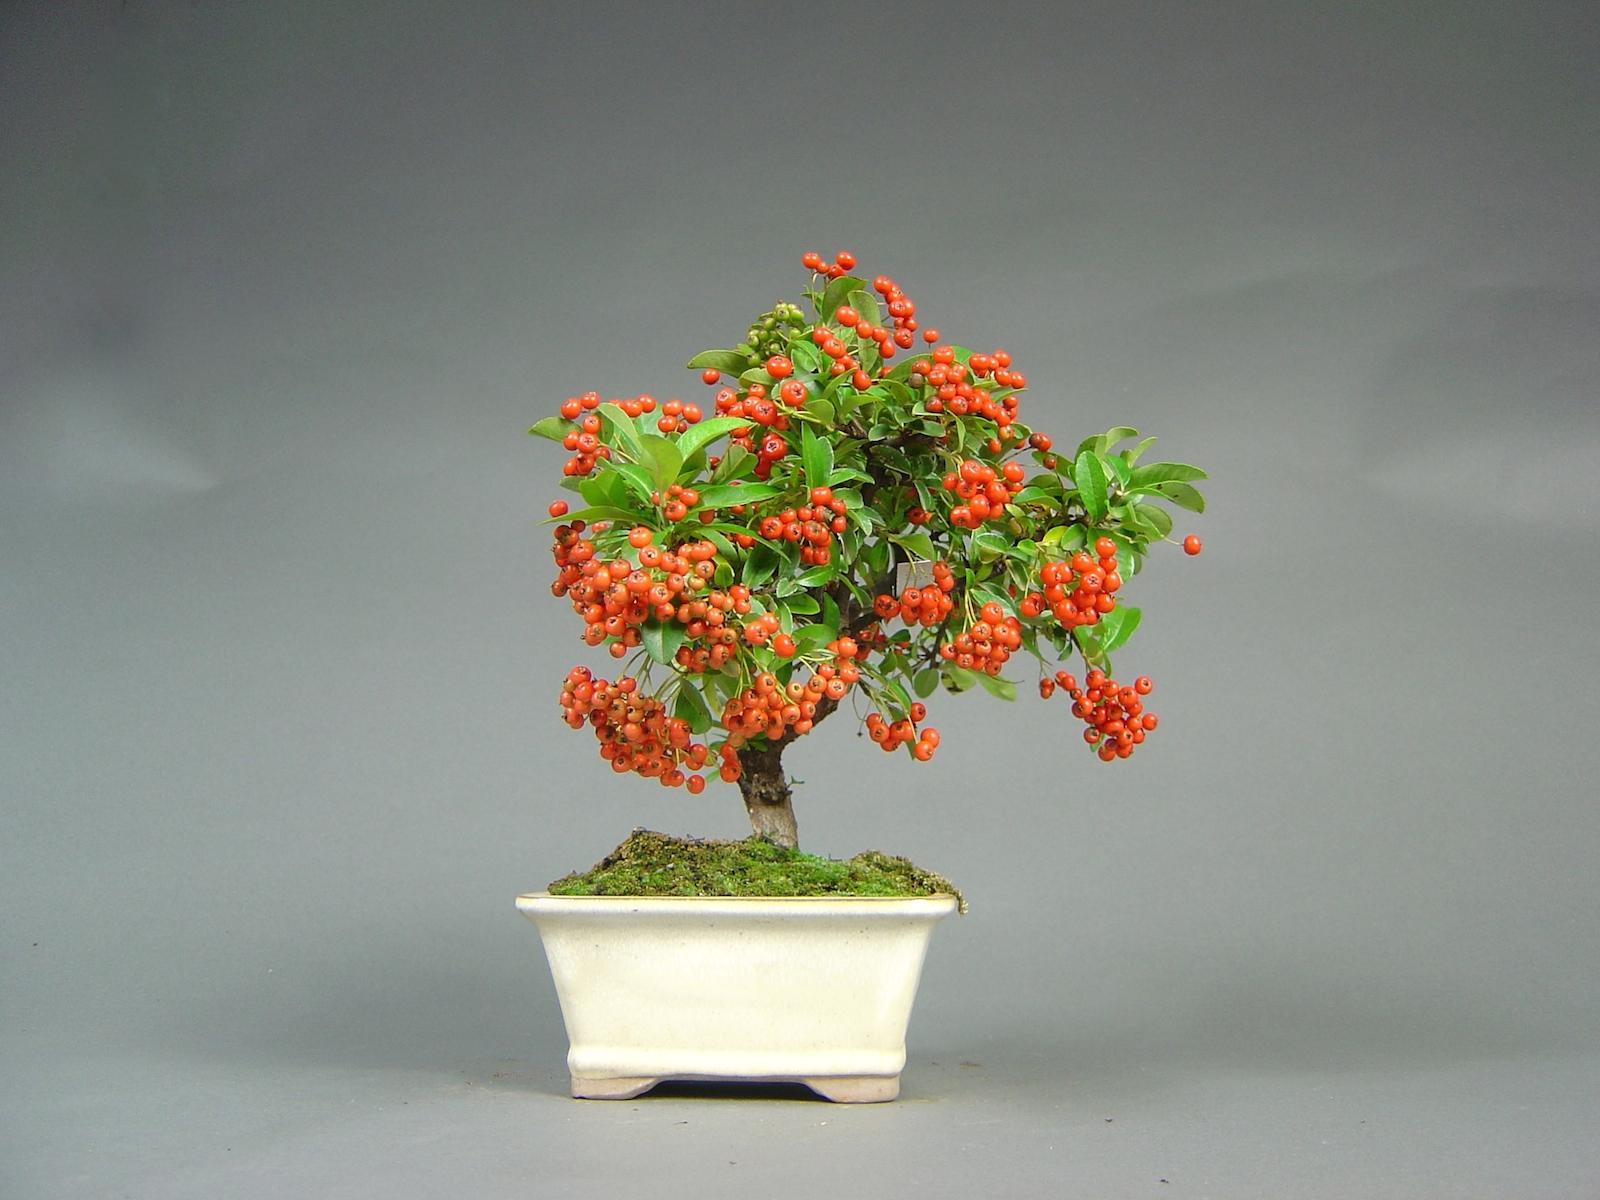 Feuerdorn, Pyracantha coccinea